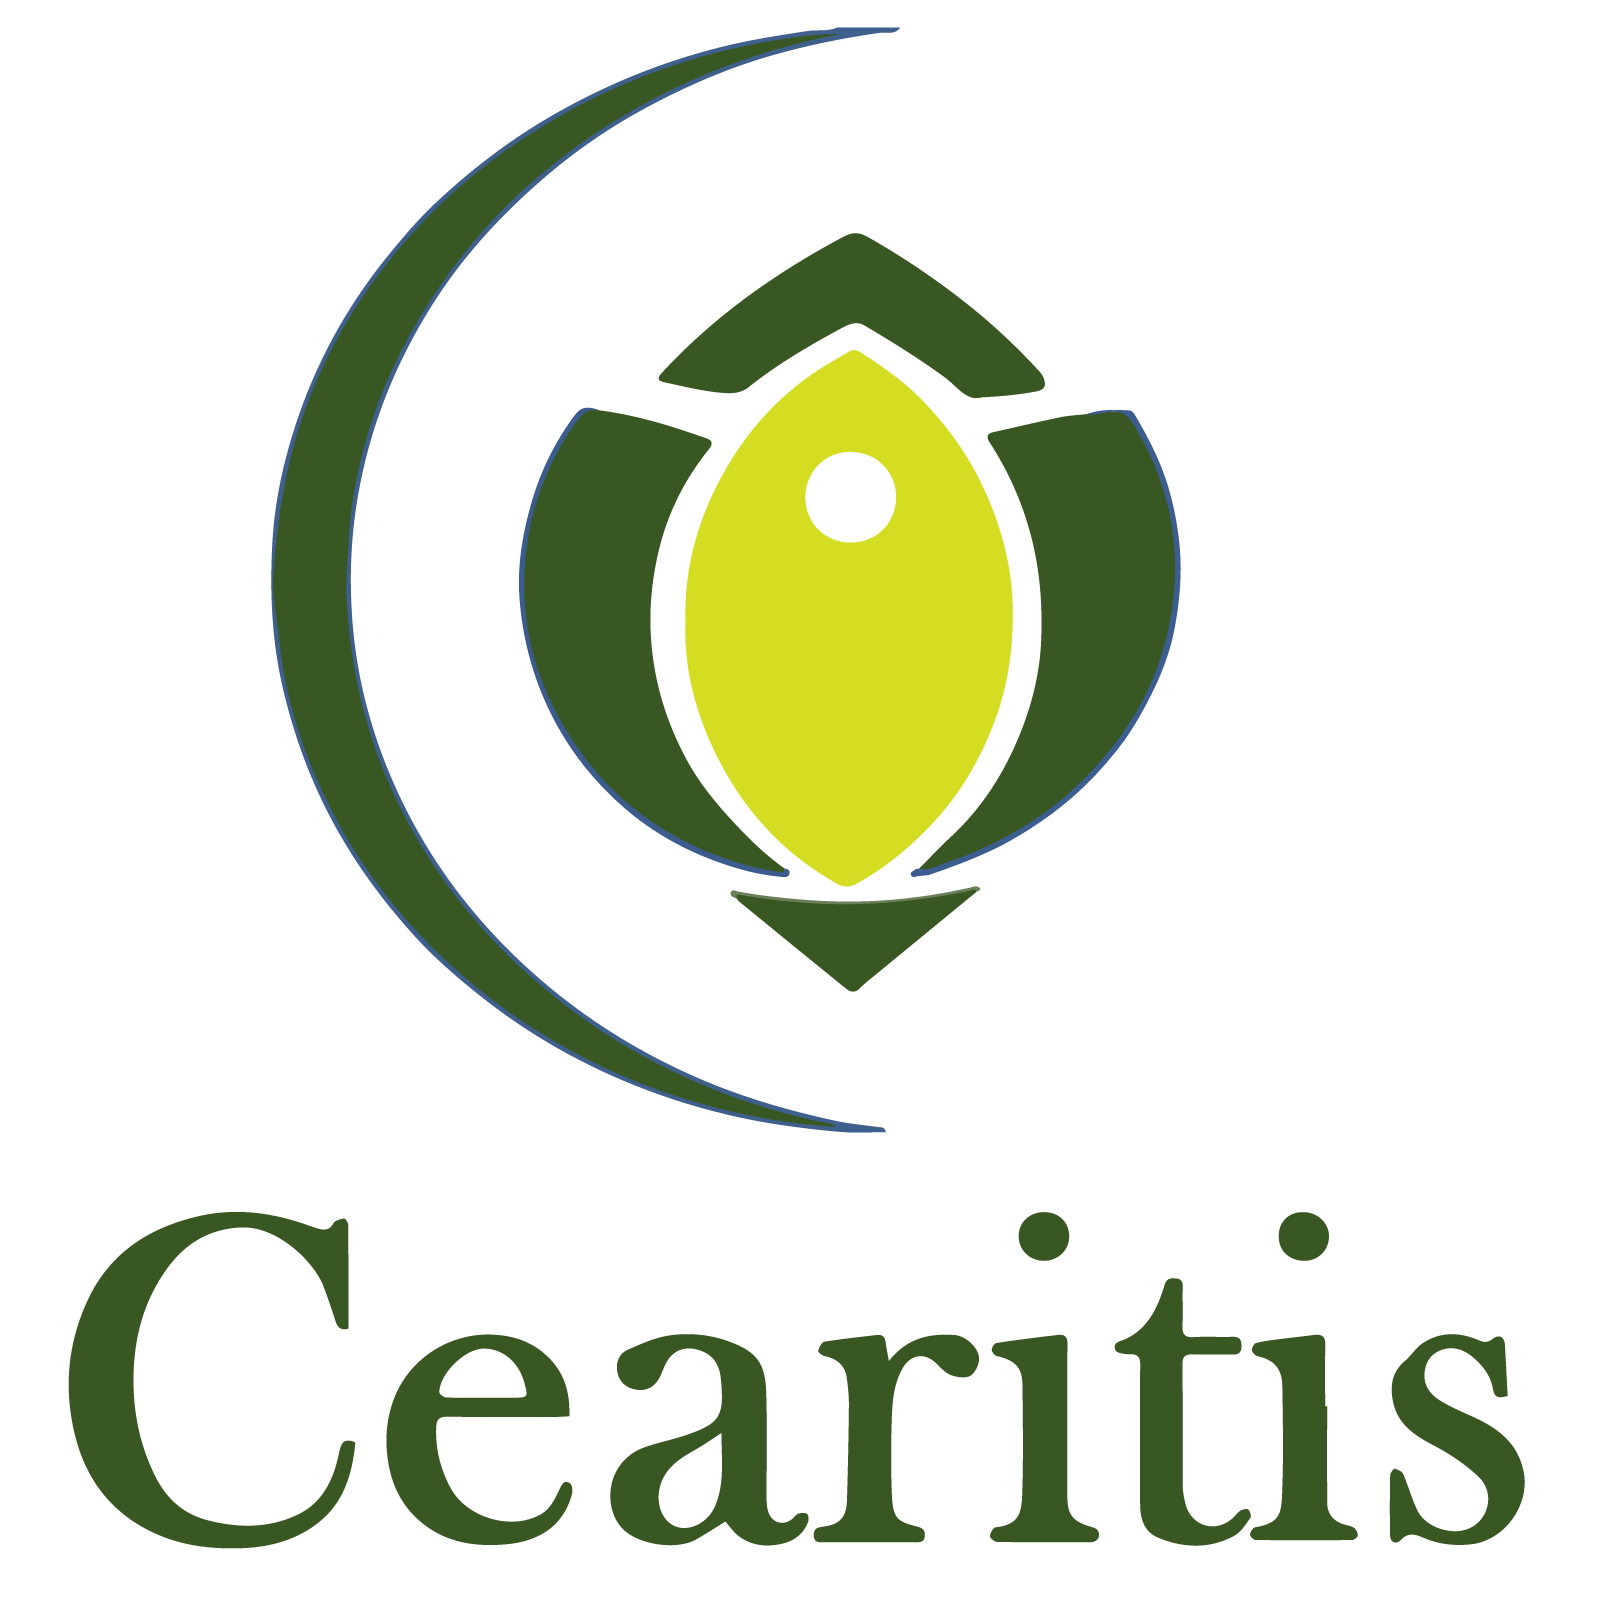 Cearitis logo